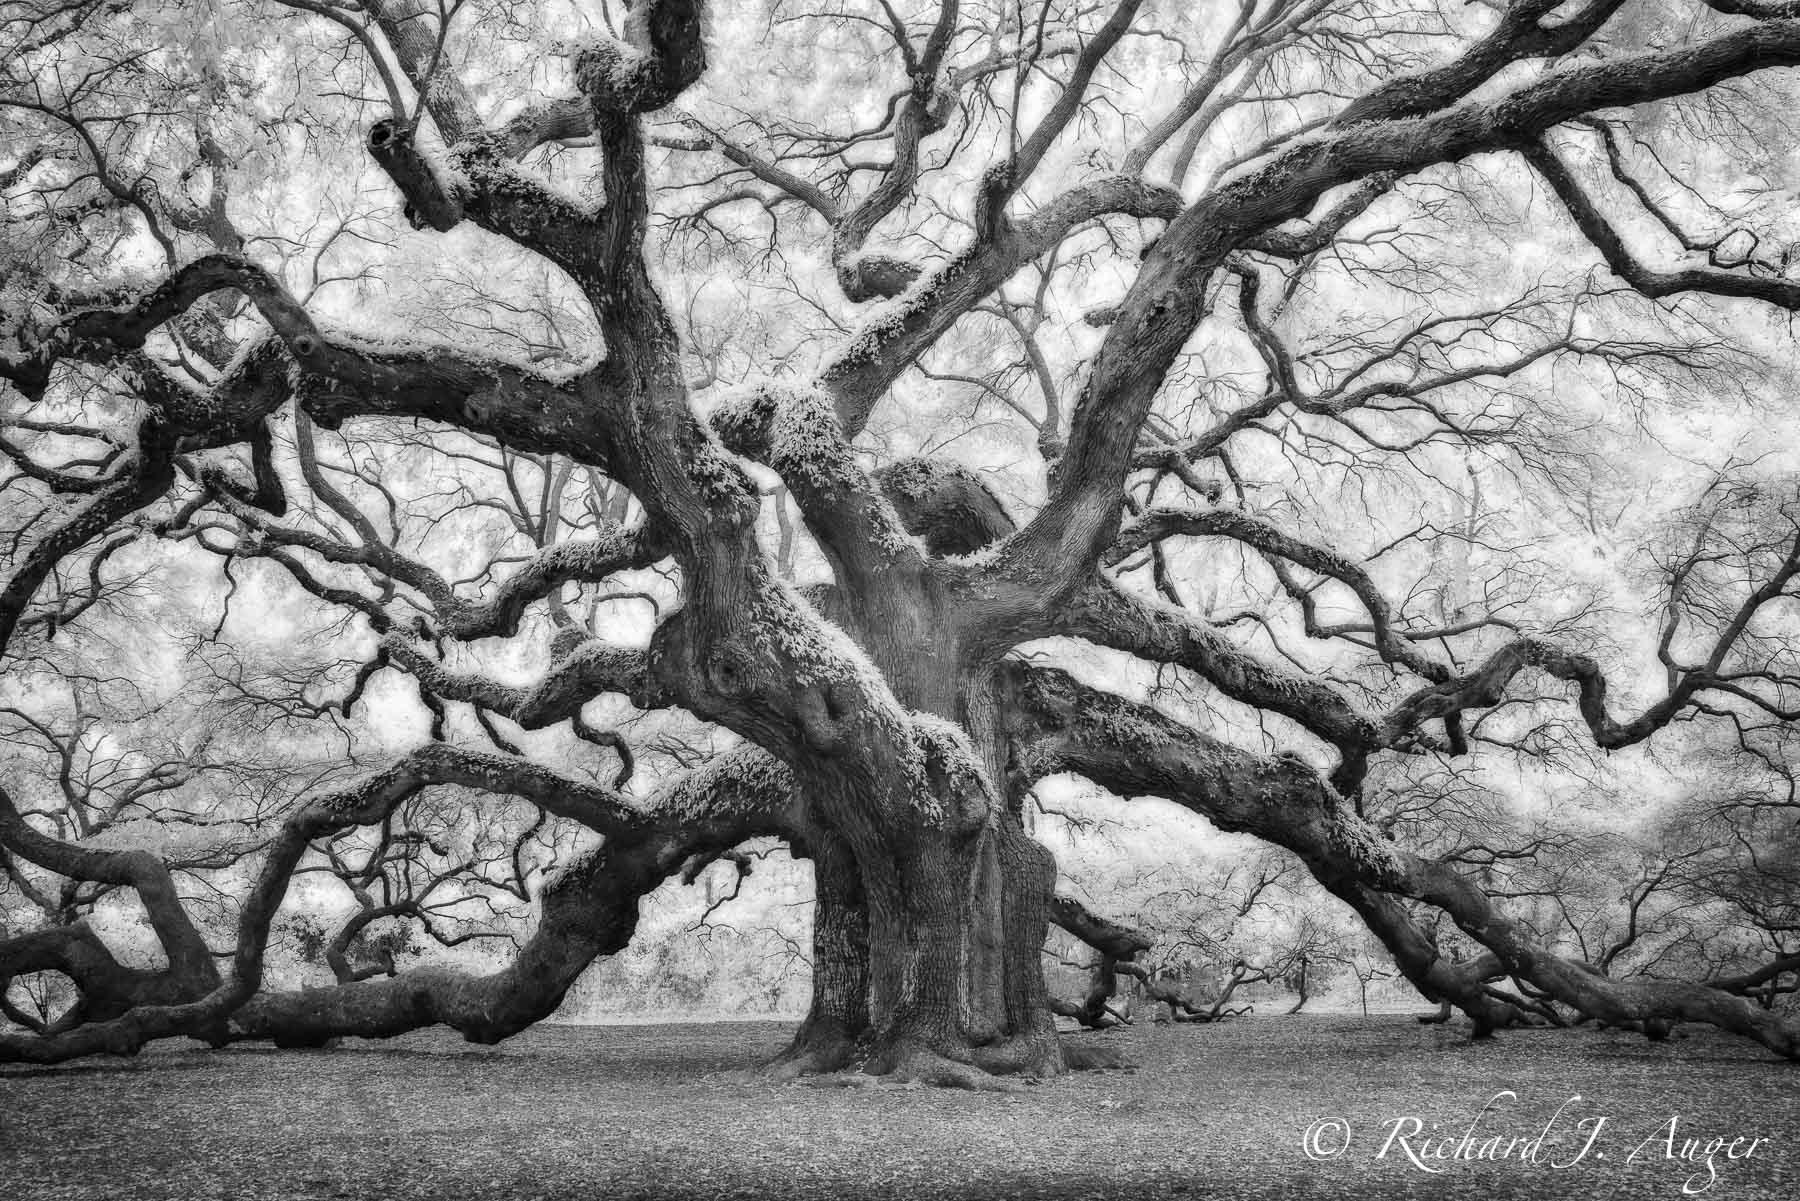 Angel Oak, South Carolina, Oak Tree, forest, black and white, photograph, nature